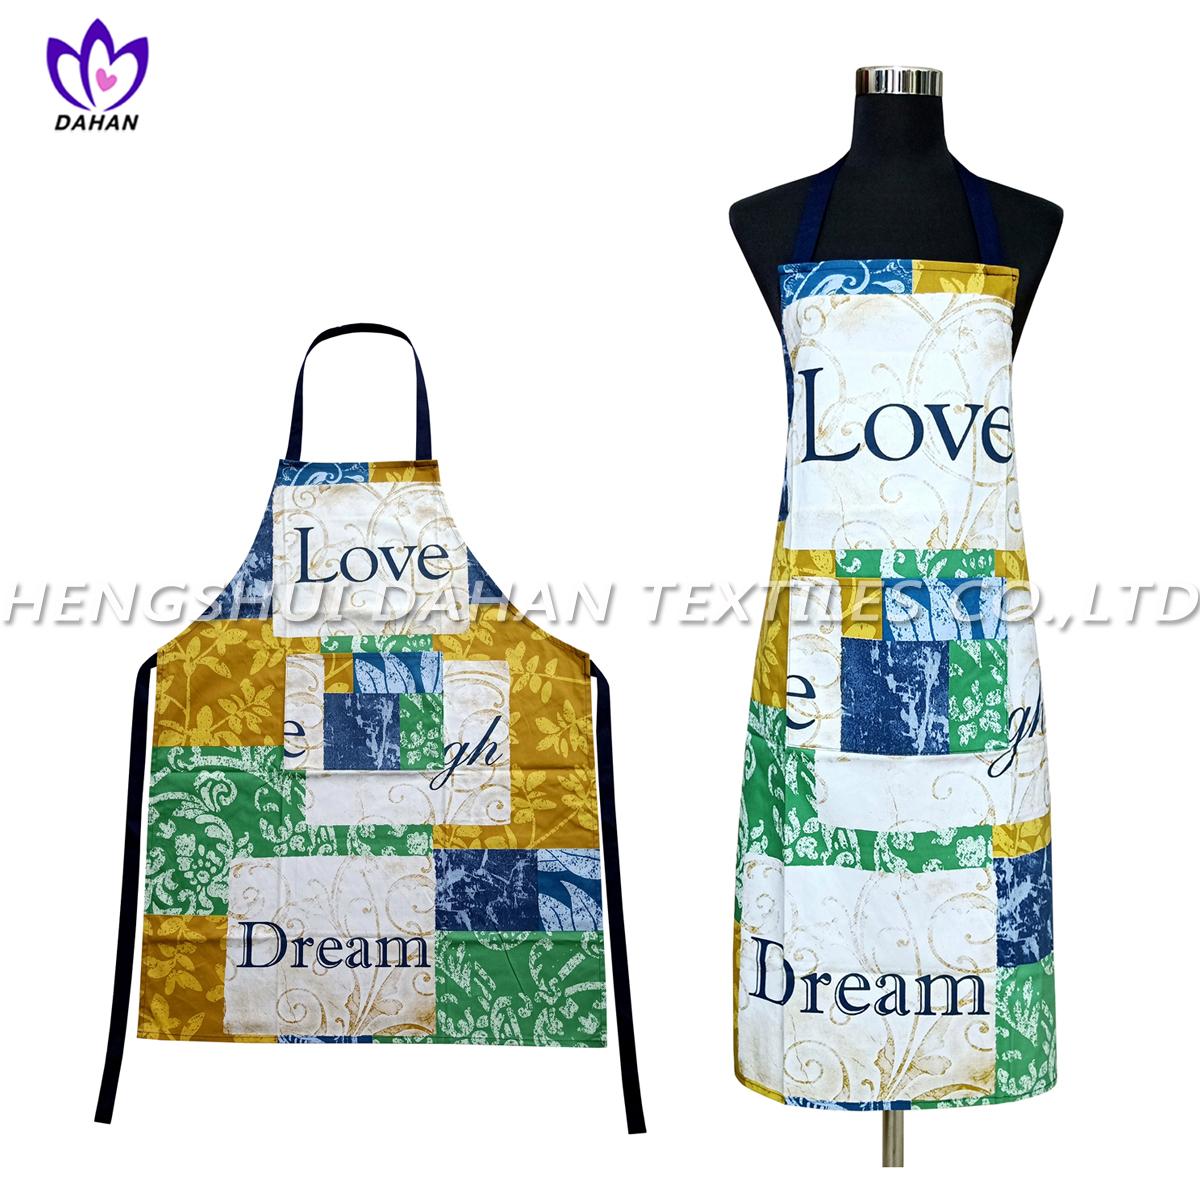 AGP74 100%cotton twill printing waterproof apron.